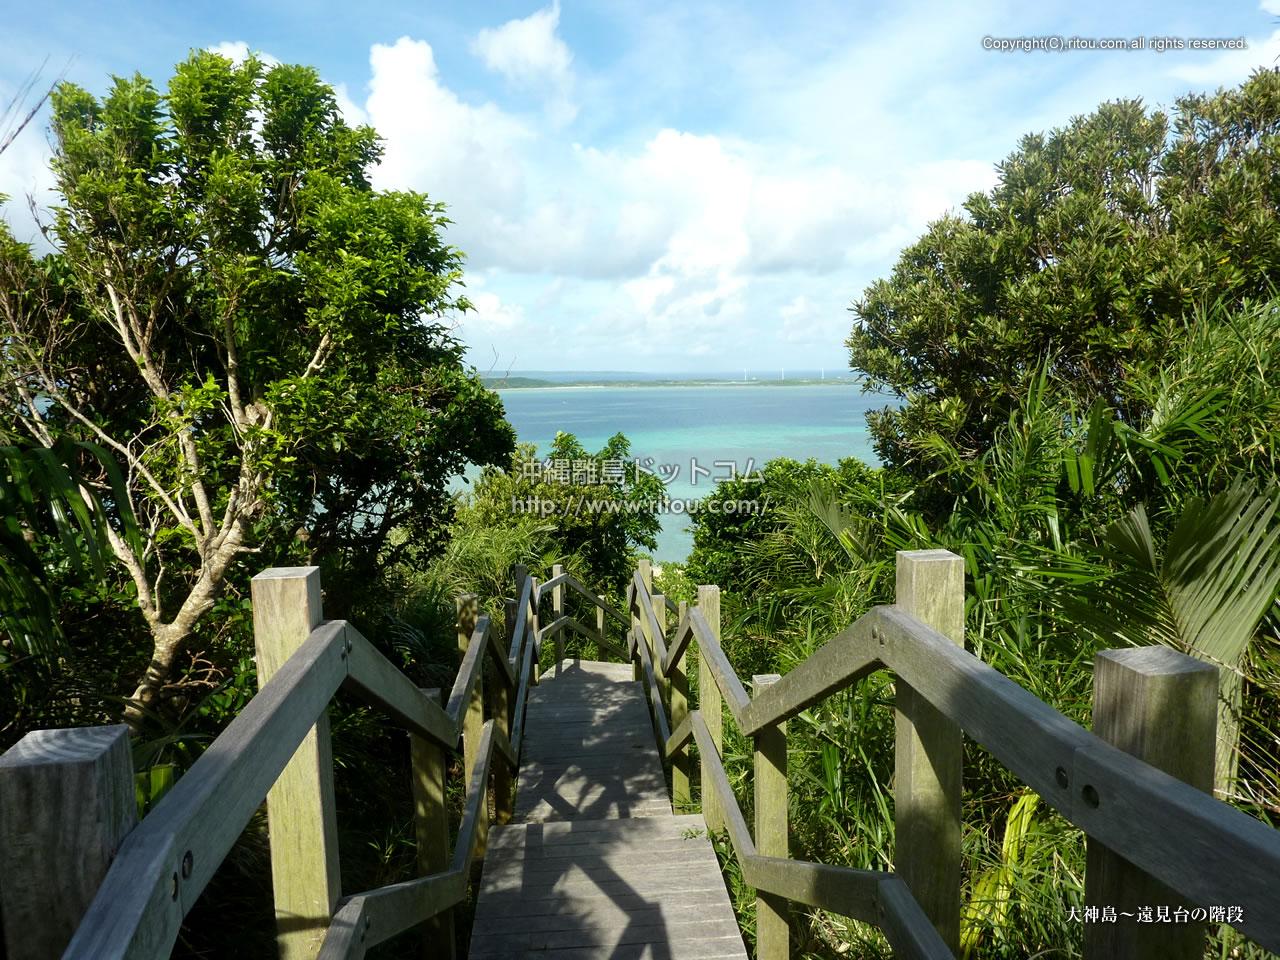 大神島〜遠見台の階段